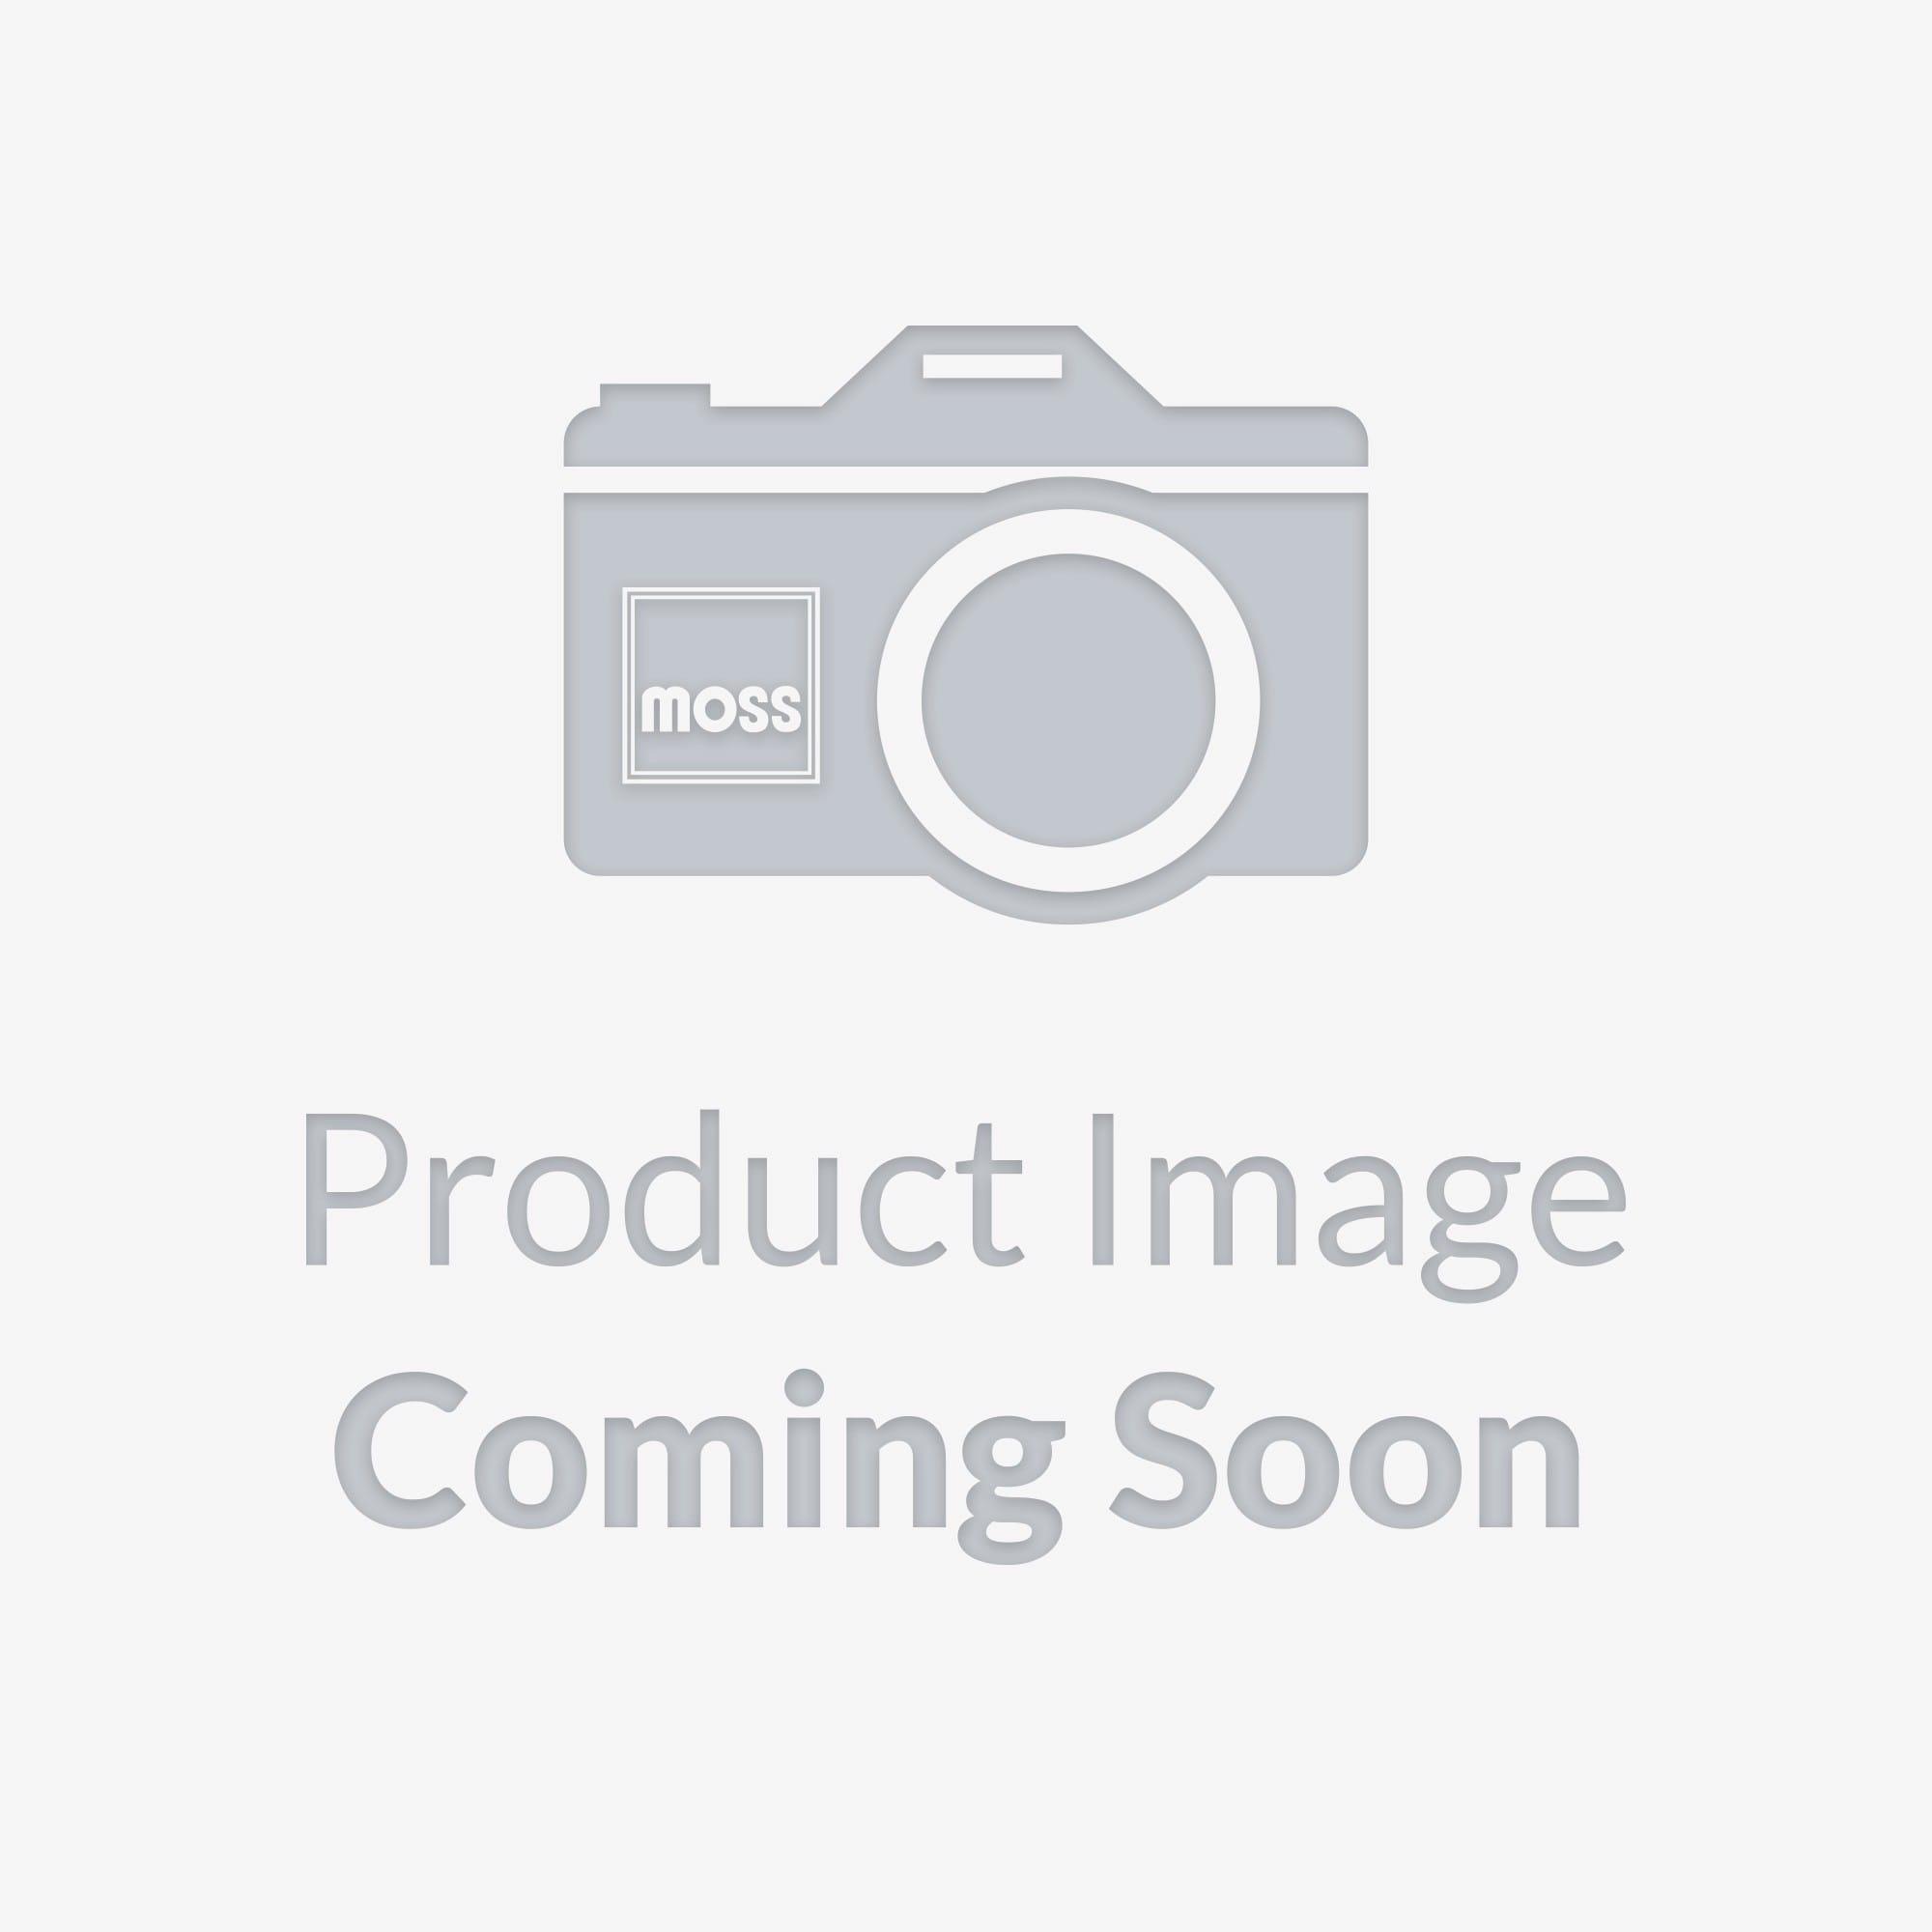 Moss Motors Catalogs | MossMiata